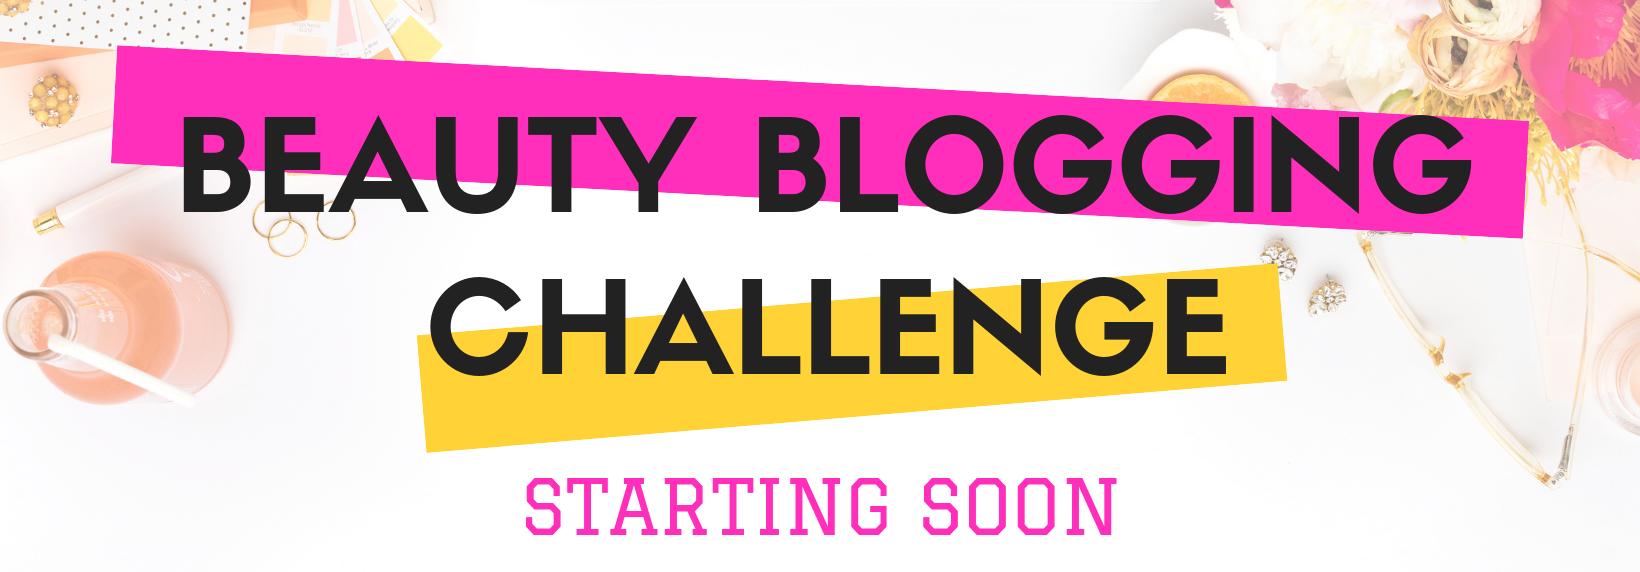 Beauty Blogging Challenge - Starting Soon!